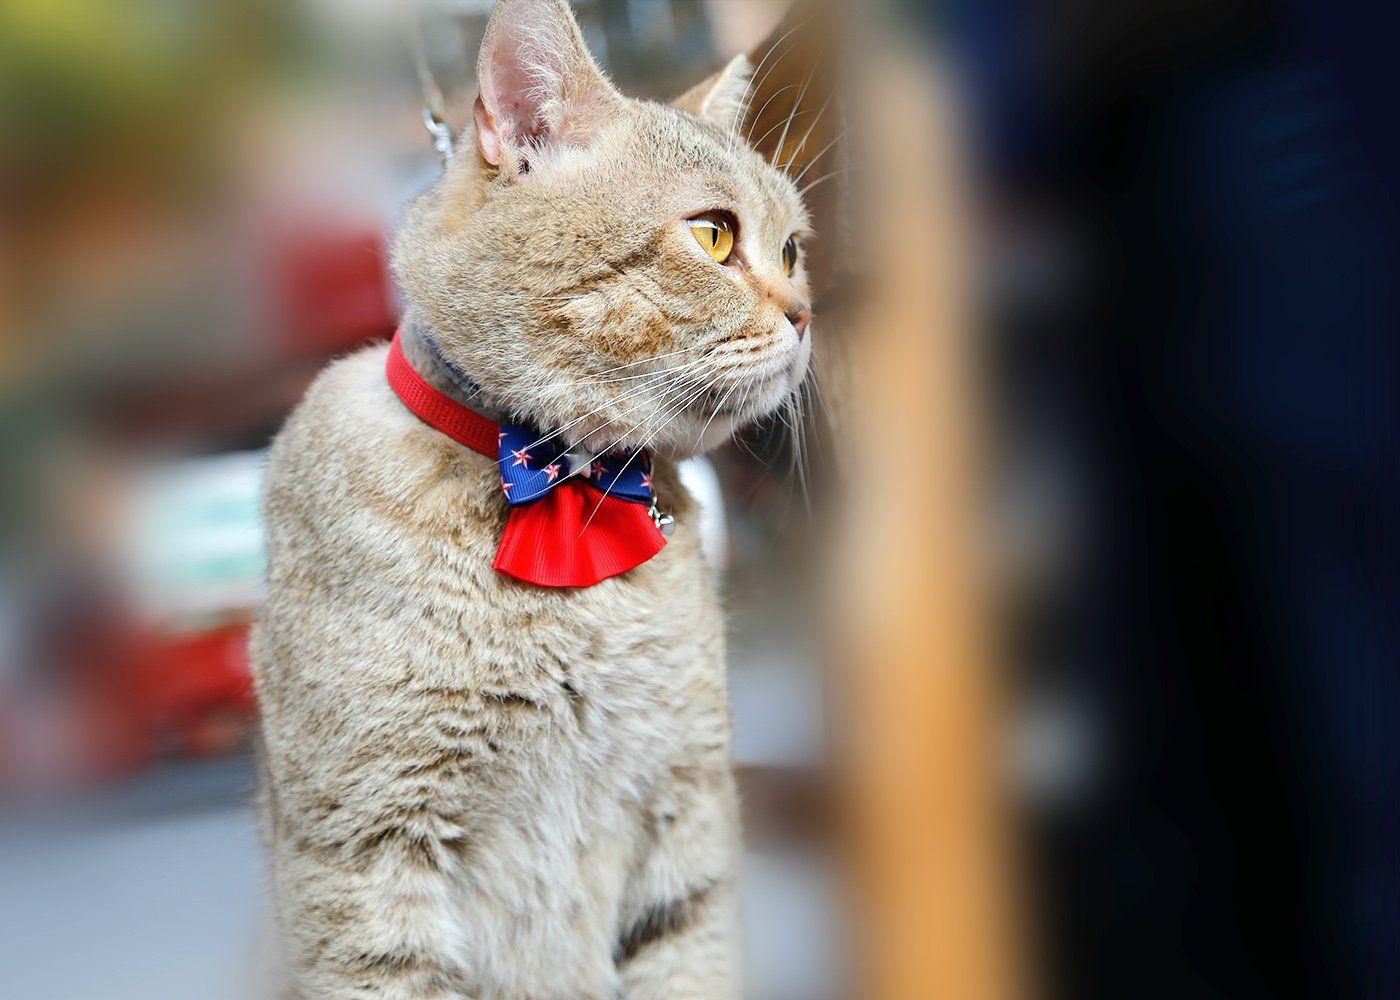 Siayi Cat Collar Adjustable Belt 812 Bowtie Kitten Collar Breakaway Pet Collar For Most Cats And Baby Puppies With Bell In 2020 Cat Collars Kitten Collars Pet Collars